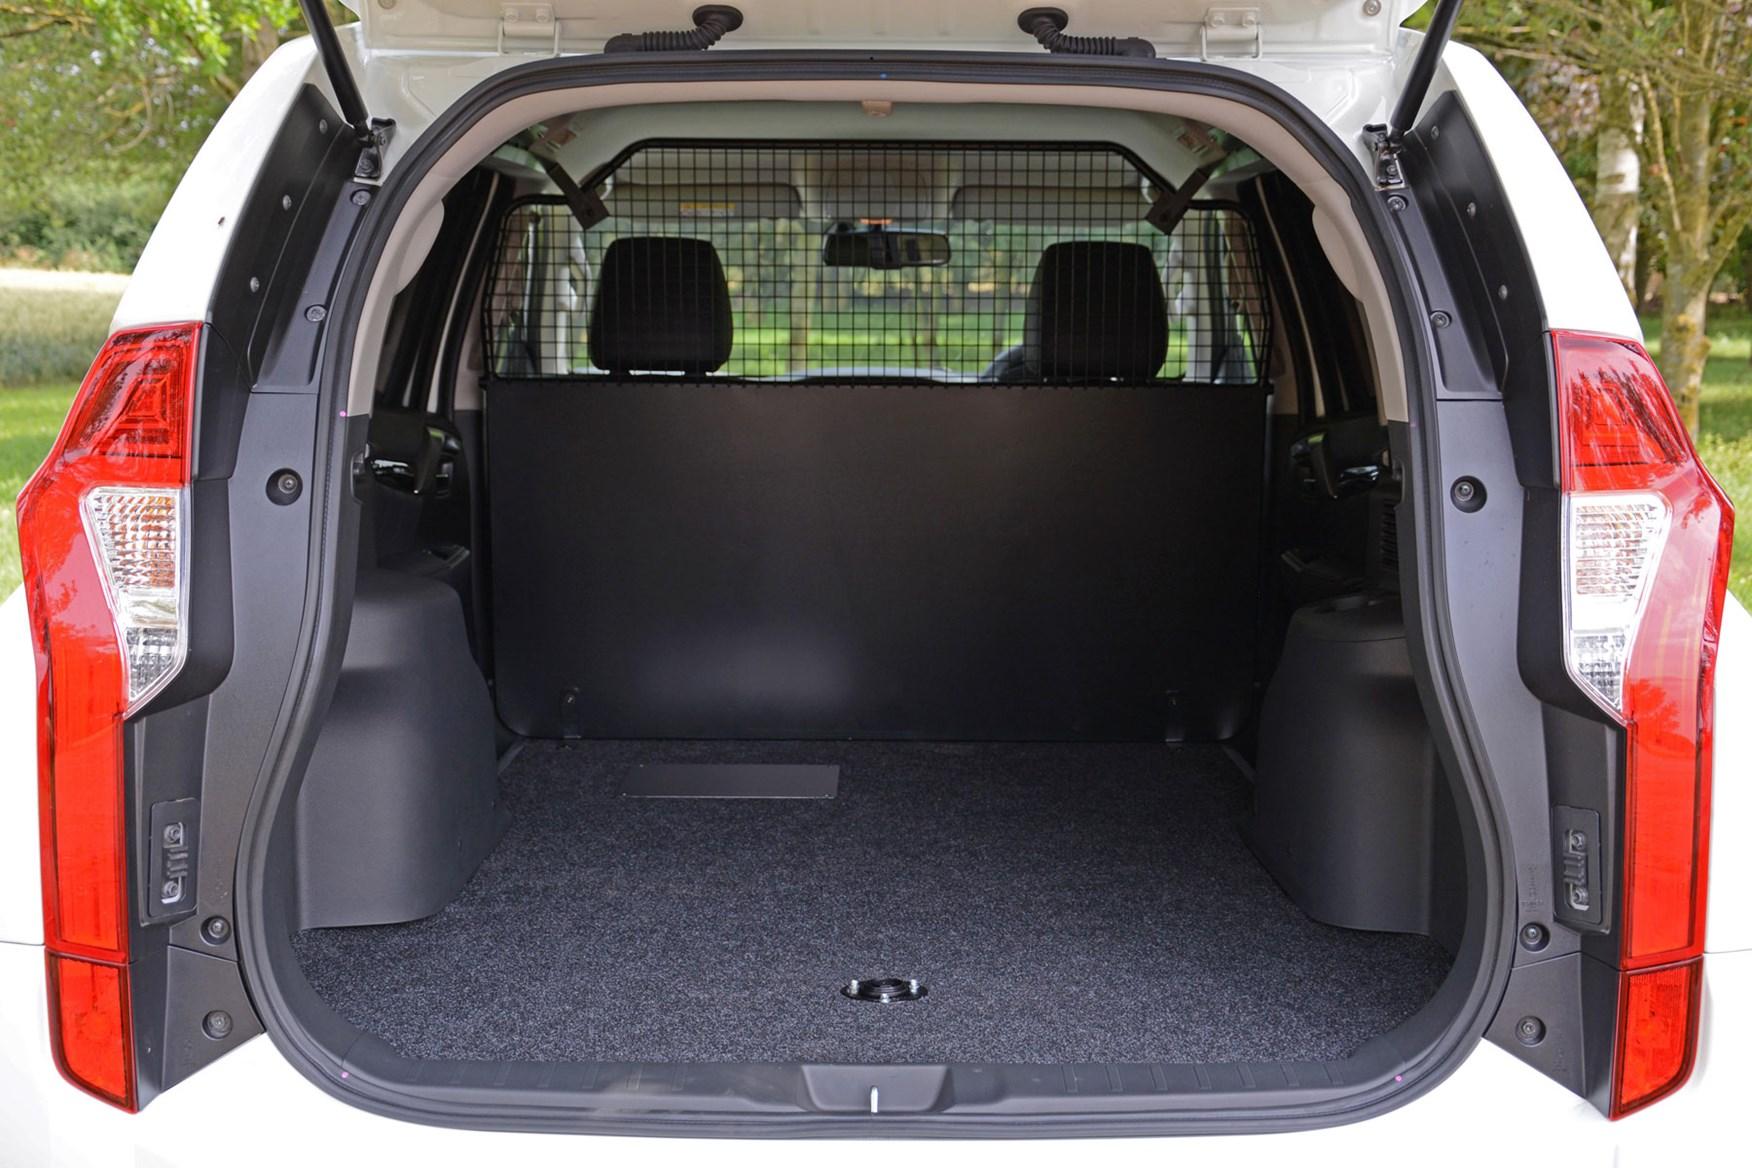 Mitsubishi Outlander Commercial 4x4 van review - load area